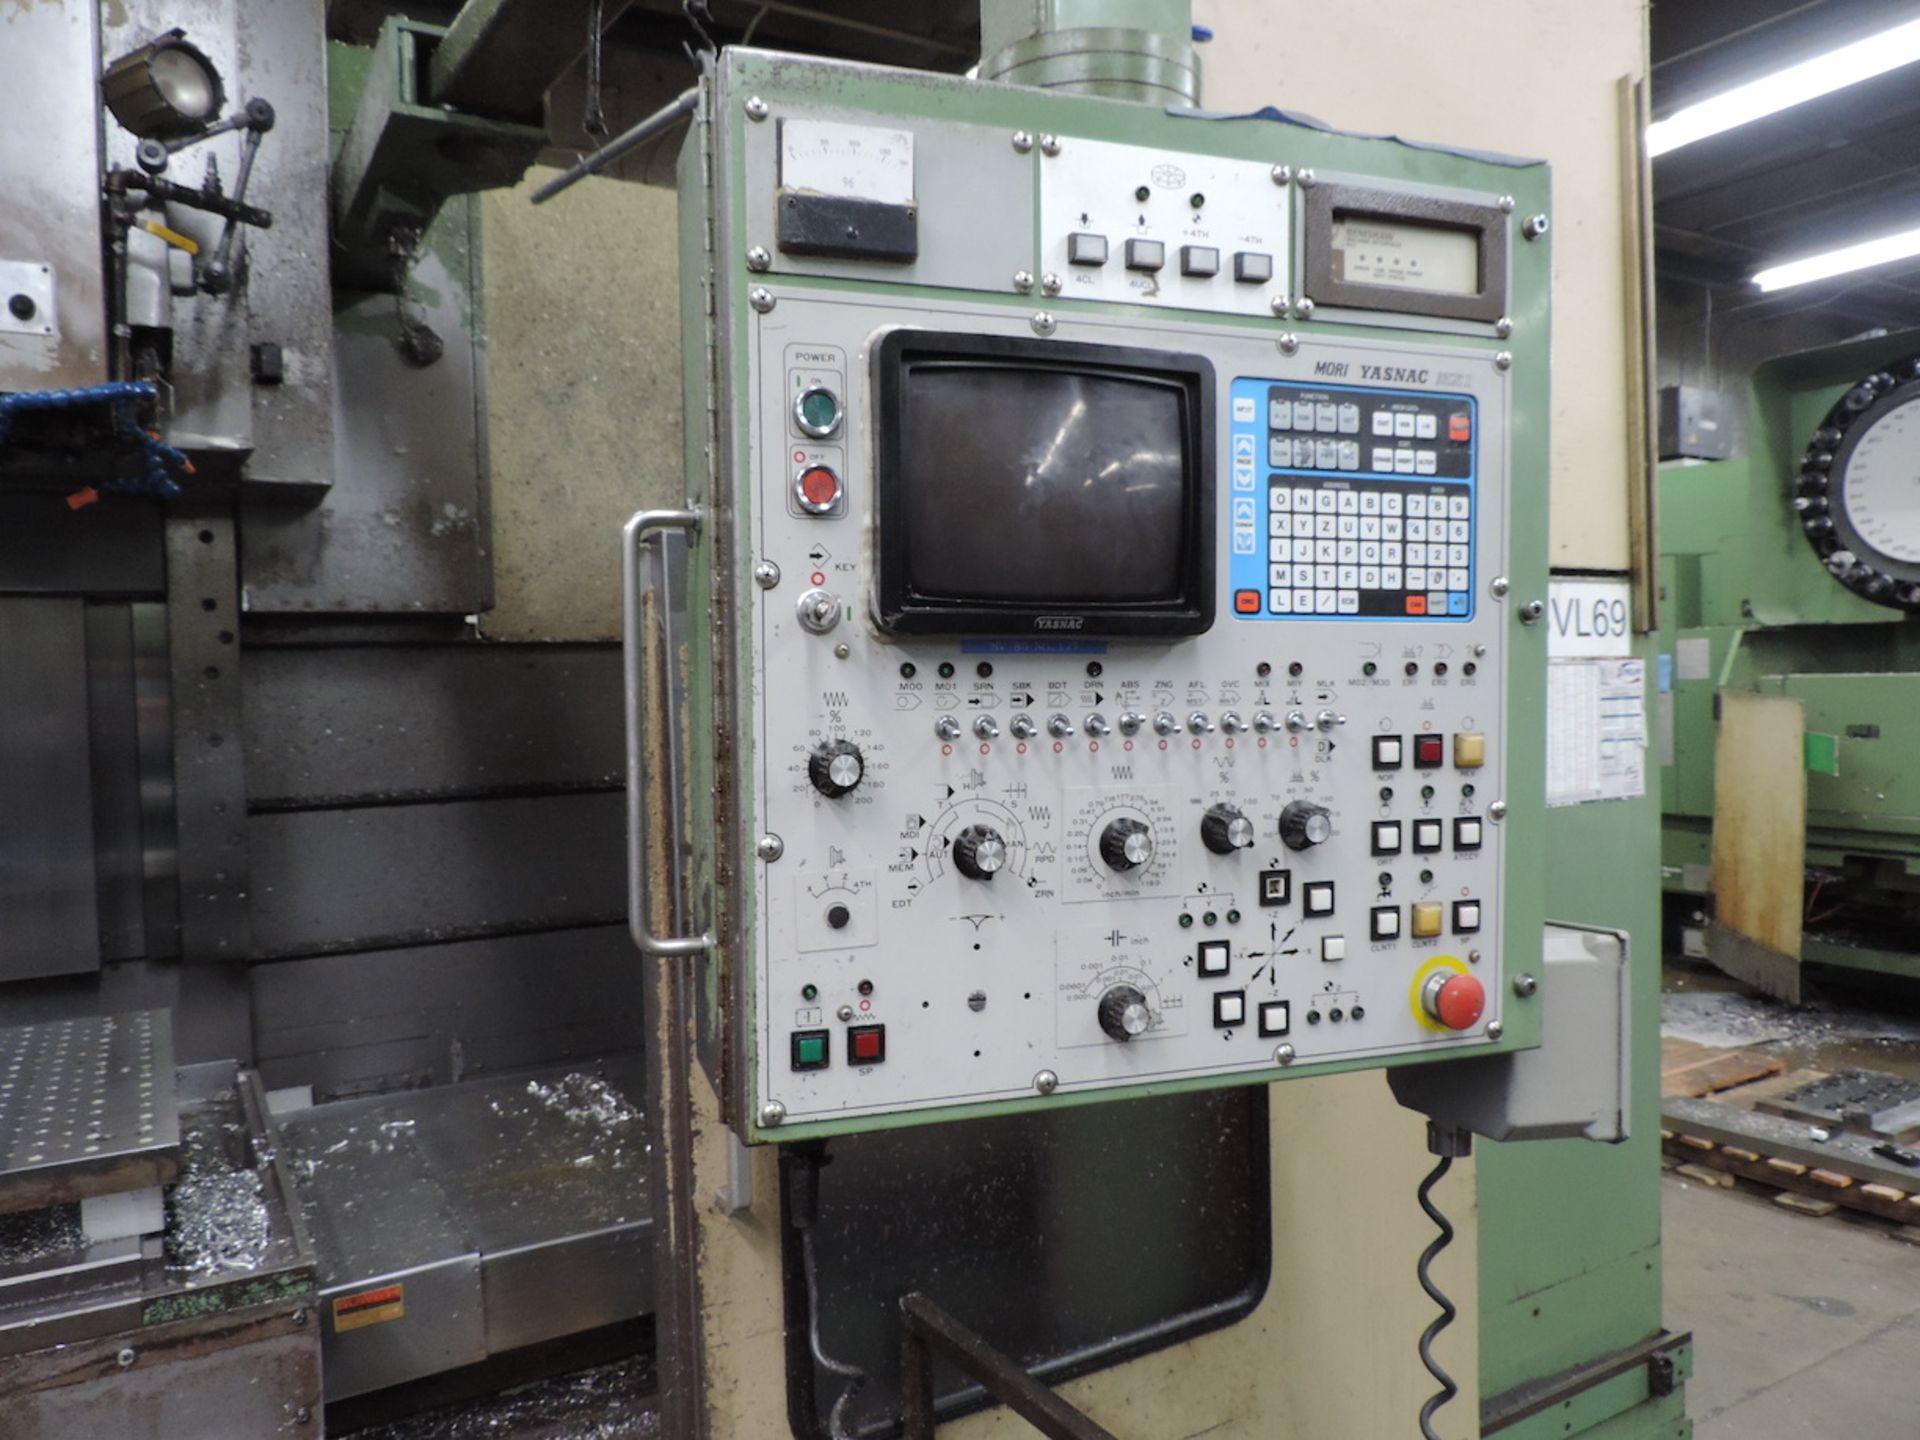 "MORI SEIKI MV-80 VMC, YASNAC MX-1 CONTROL, XYZ TRAVELS: 60"" X 31"" X 29"", 74"" X 32"" TABLE, 50 SPINDLE"